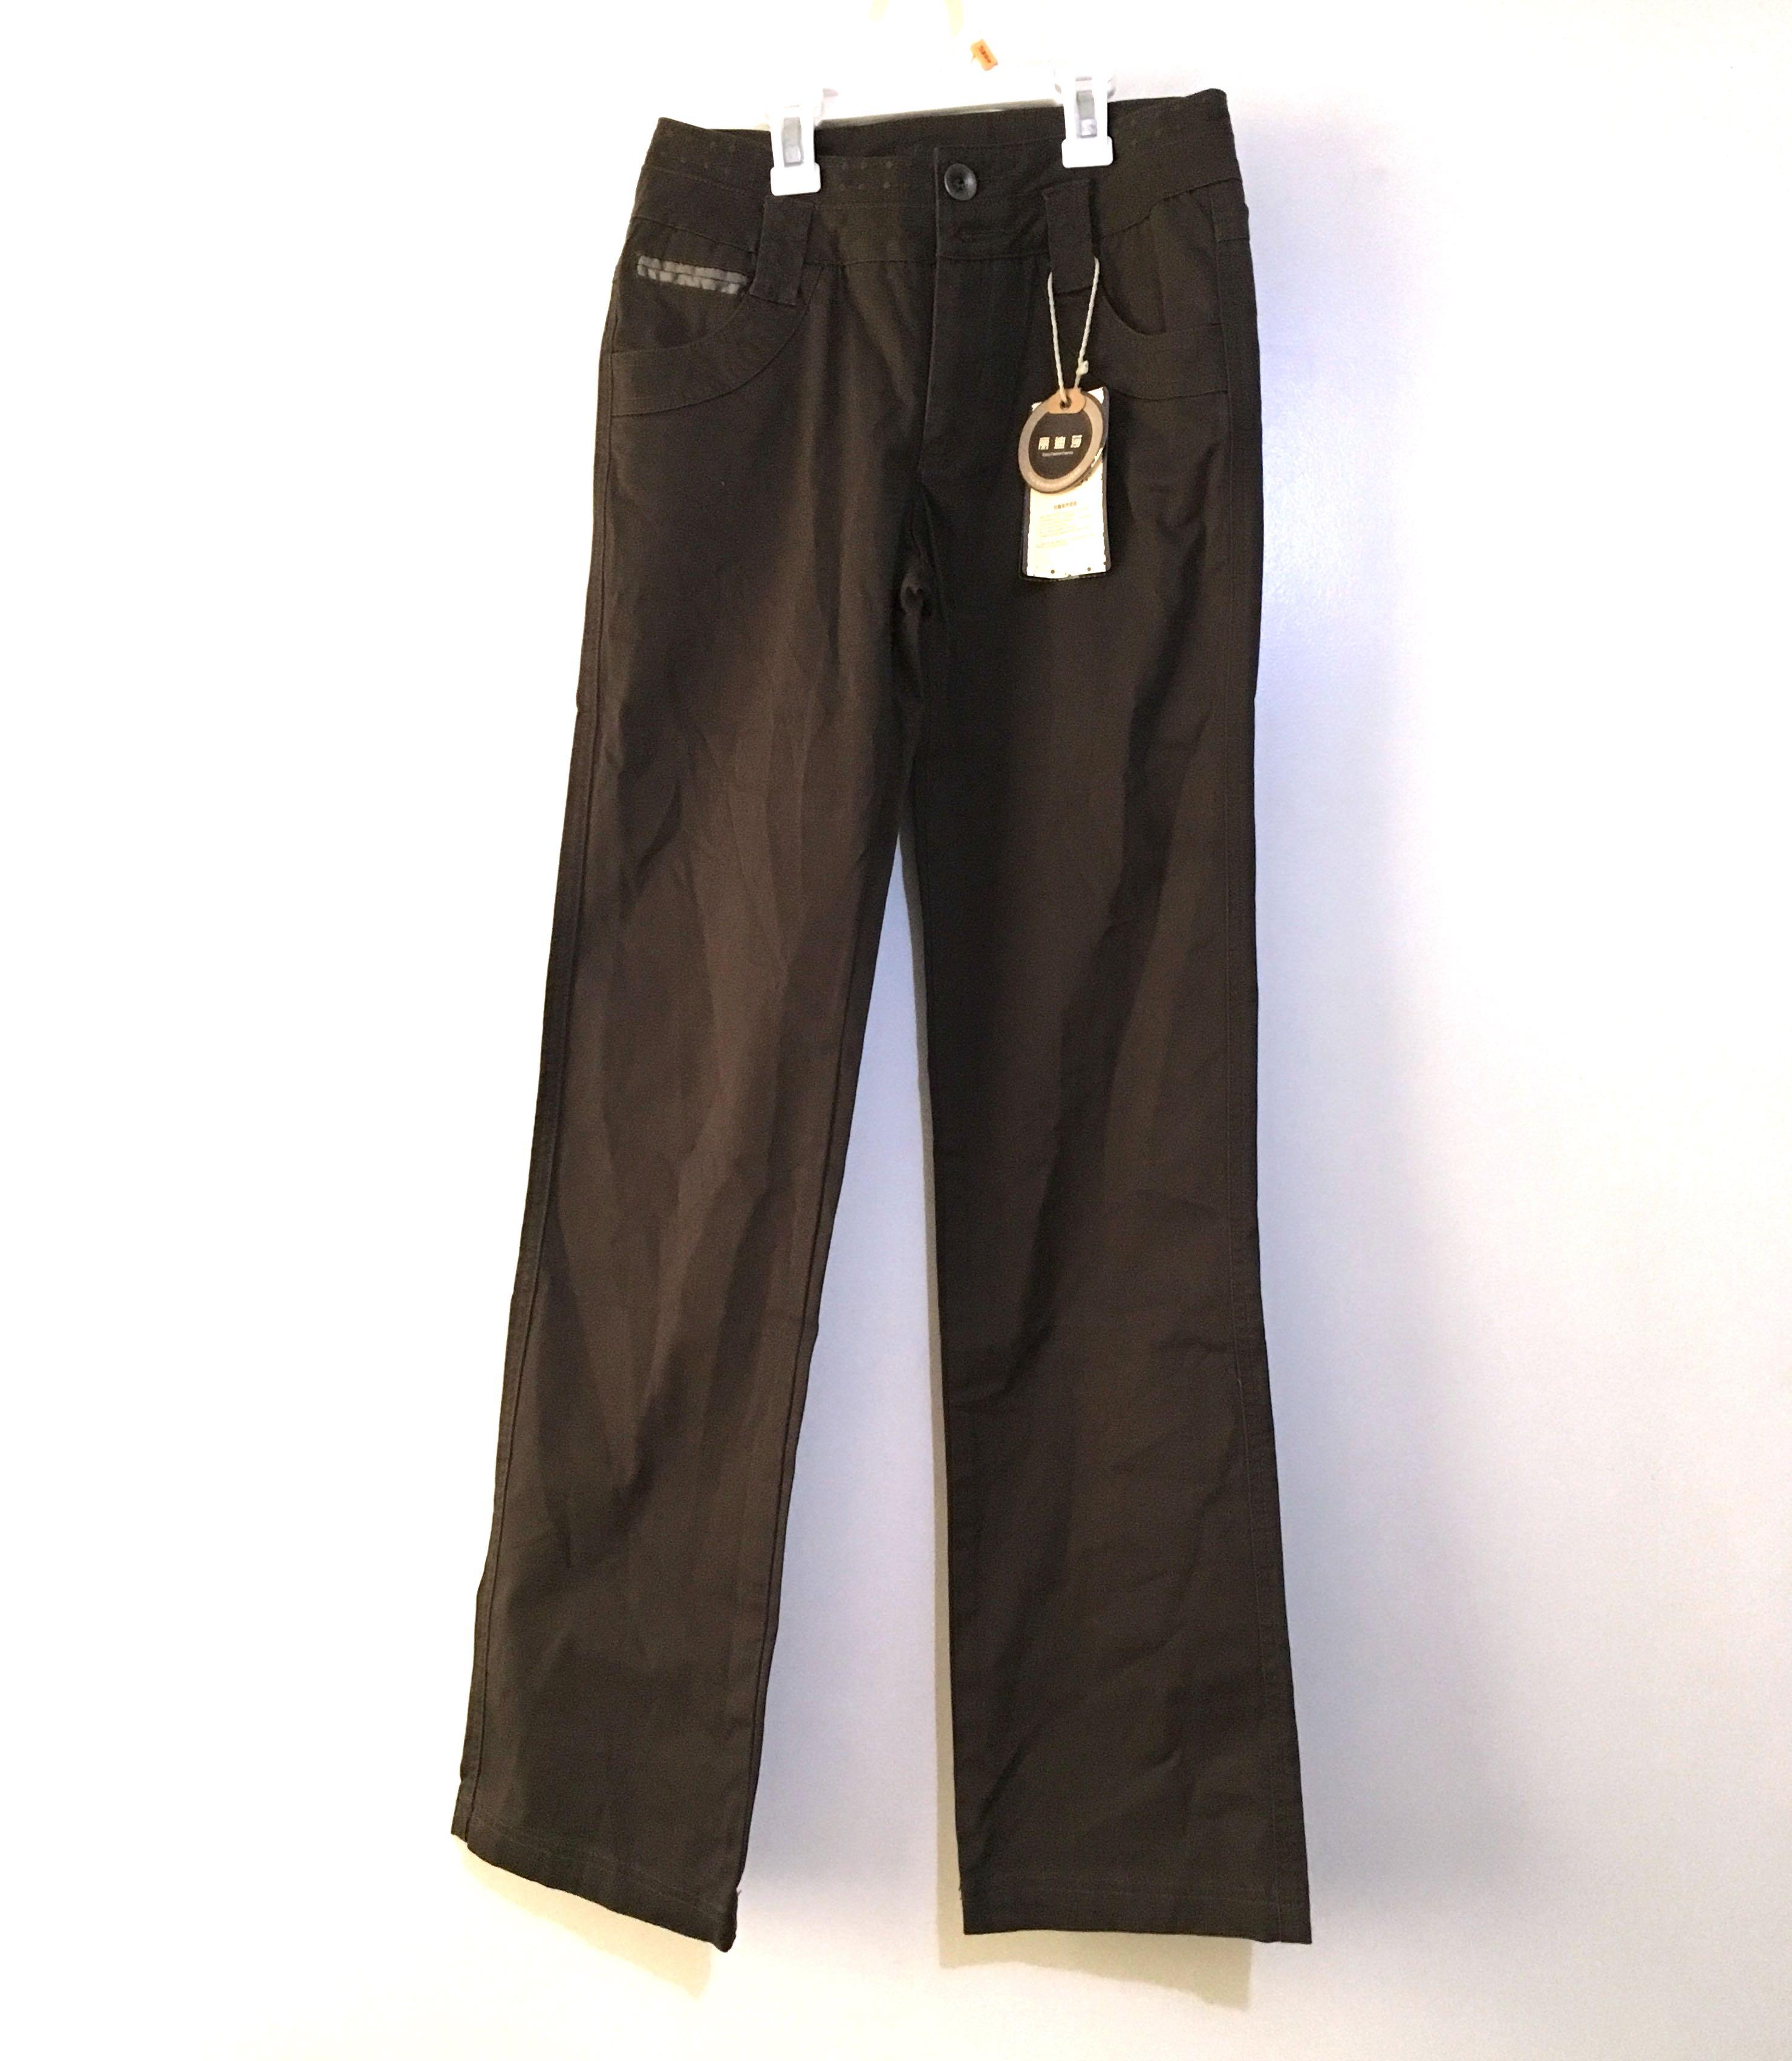 Charity Sale! Authentic Lidisha Brown Dress Khaki Women's Pants Size Small